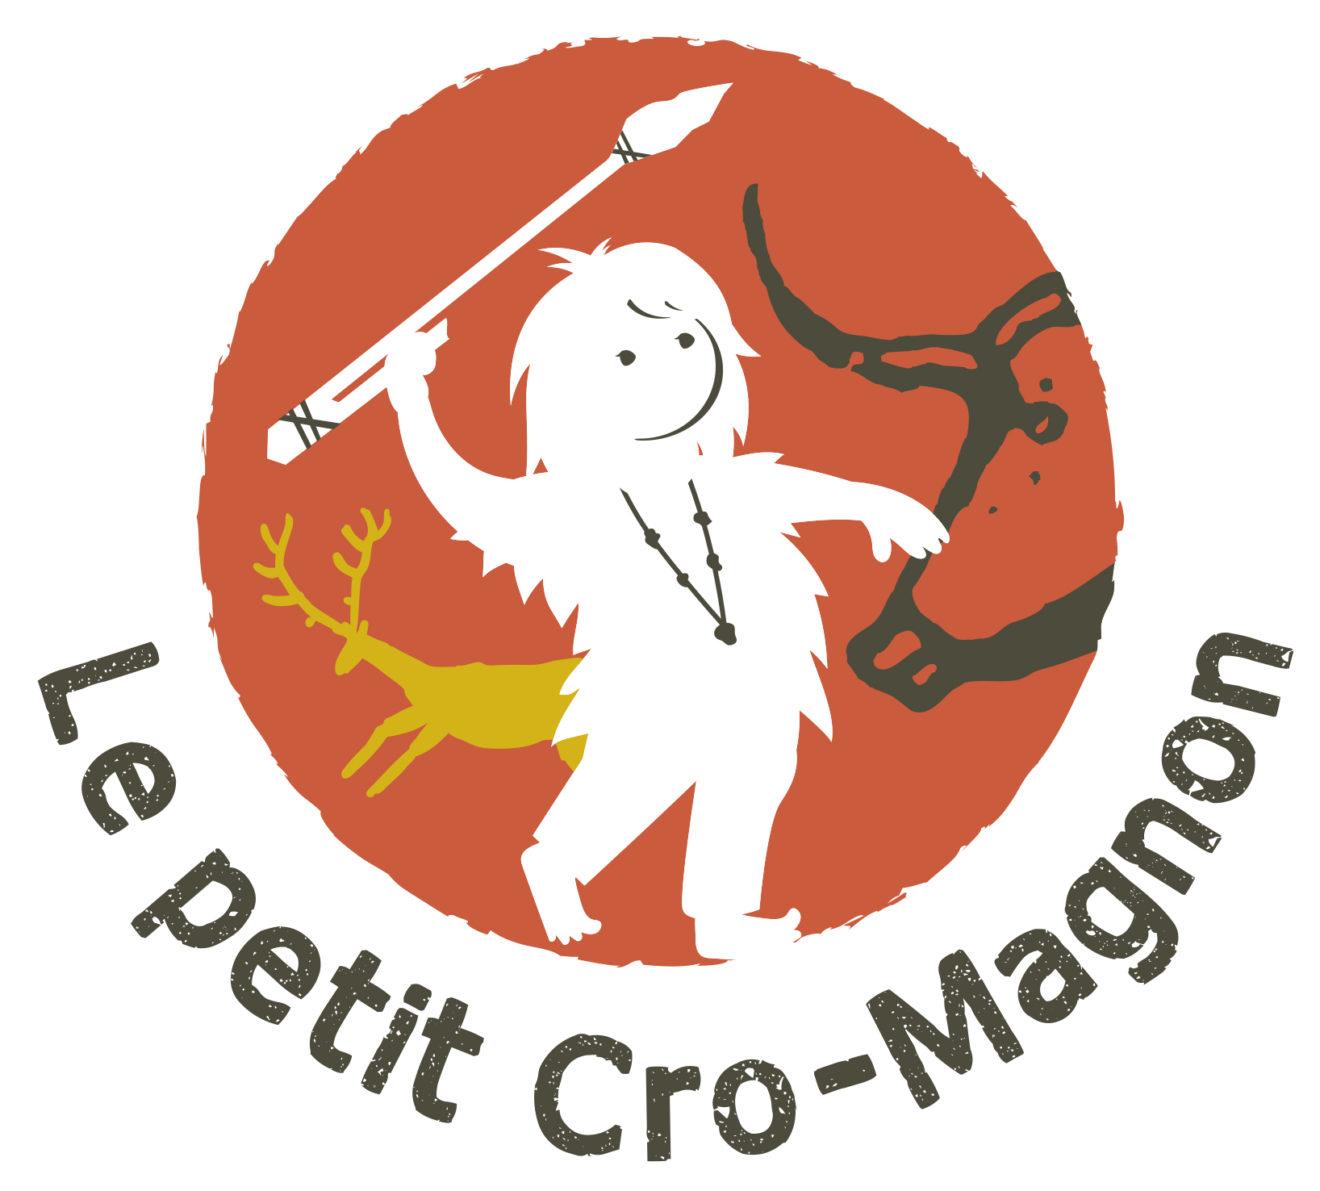 le Petit Cro-magnon - logo